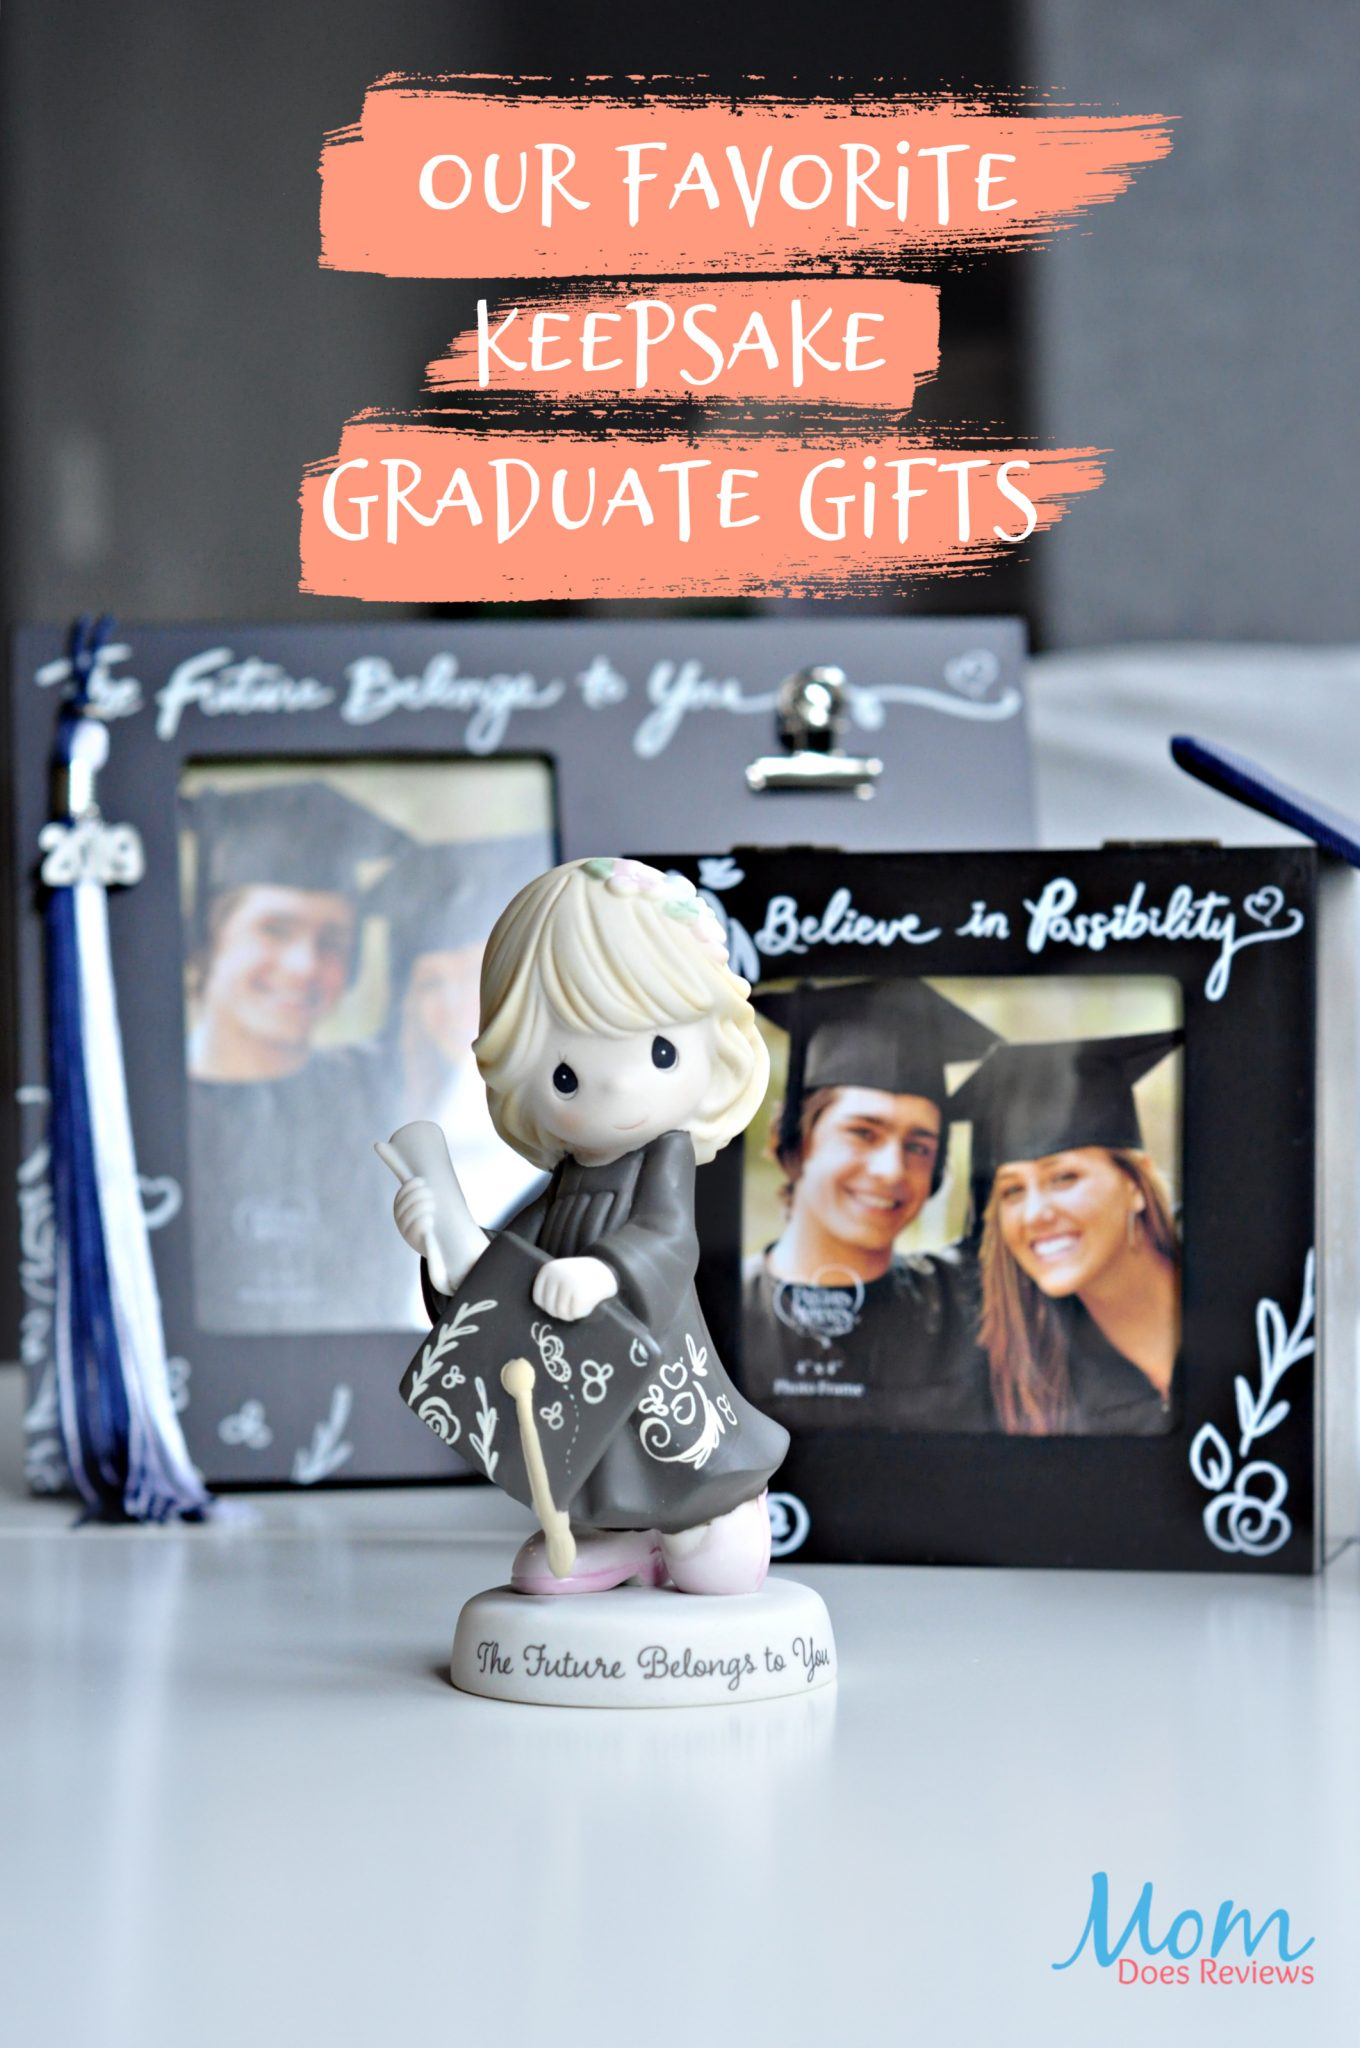 Our favorite keepsake graduate gifts